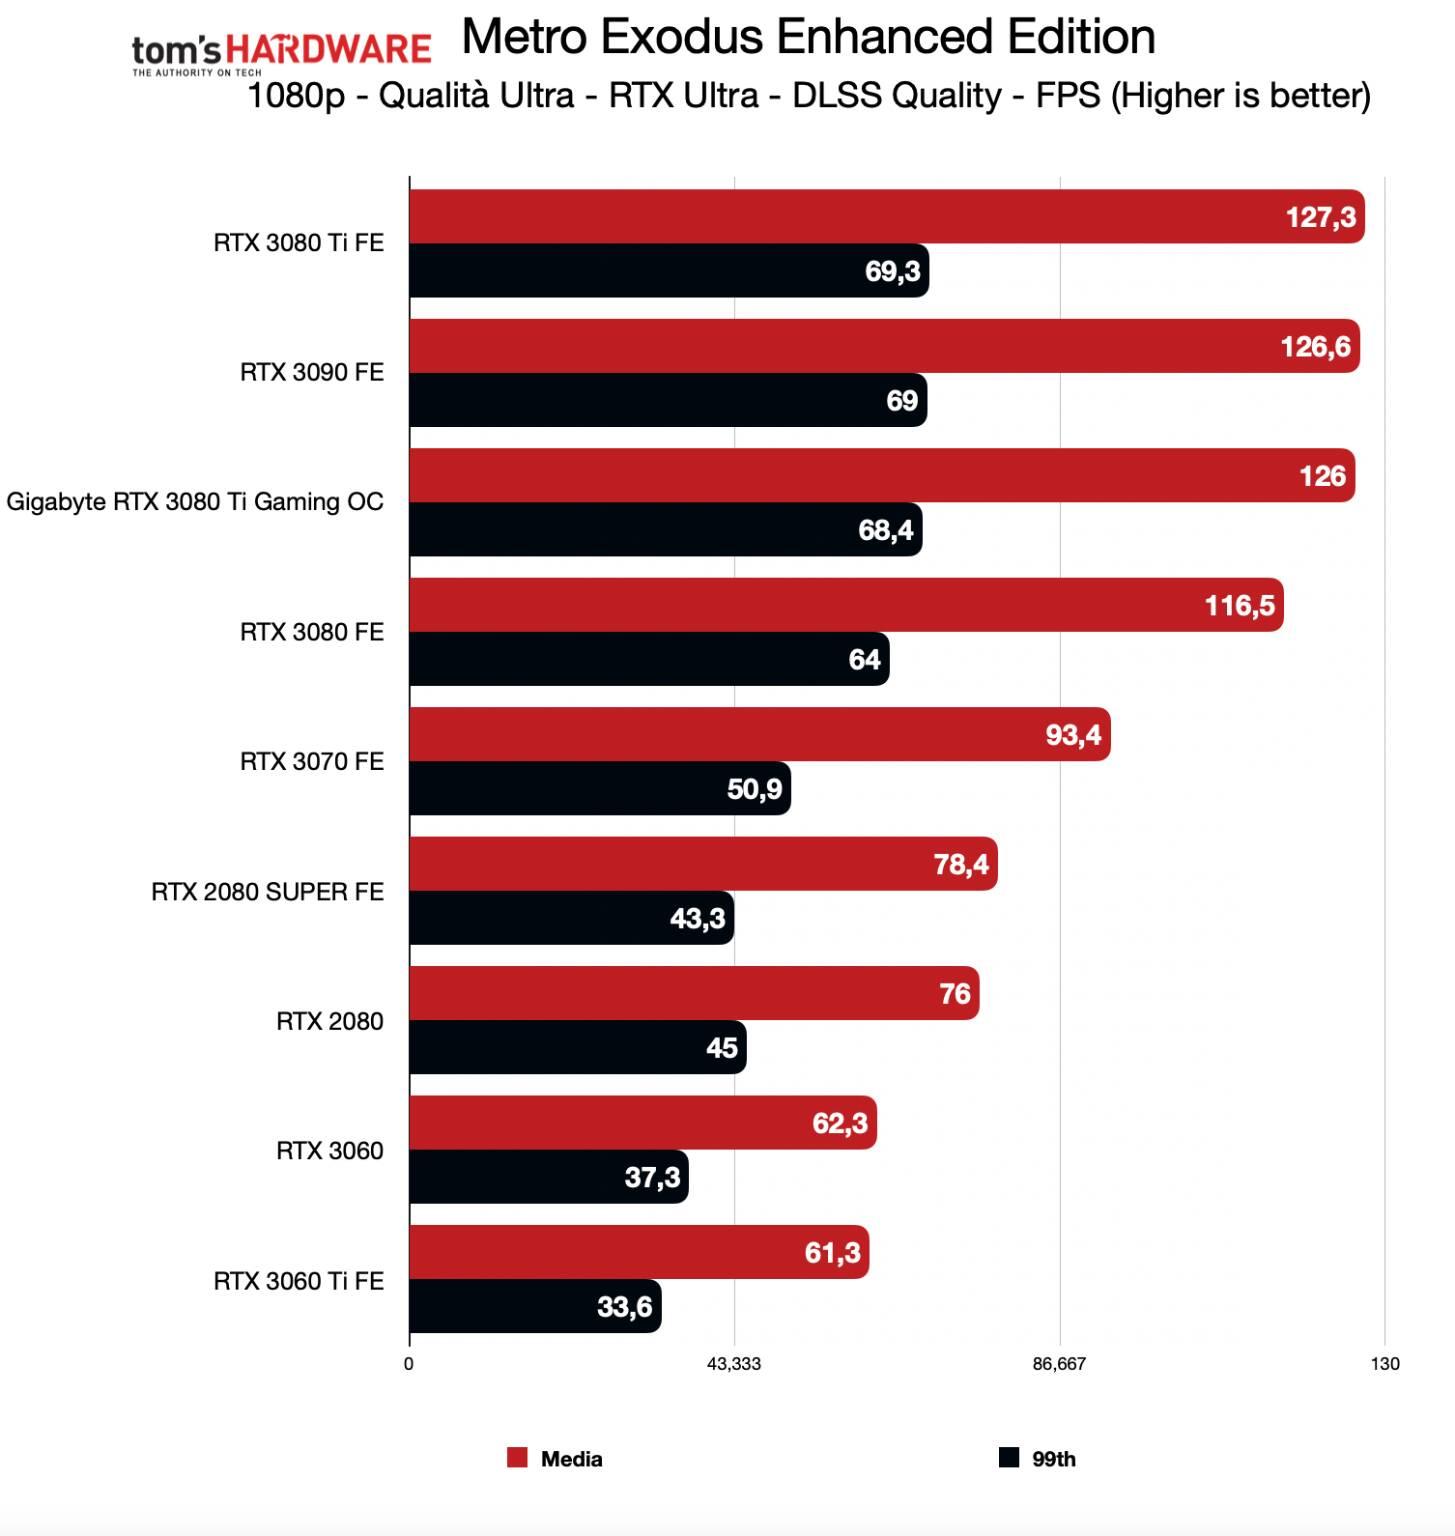 Benchmark Gigabyte RTX 3080 Ti Gaming OC - FHD RTX DLSS - Metro Exodus Enhanced